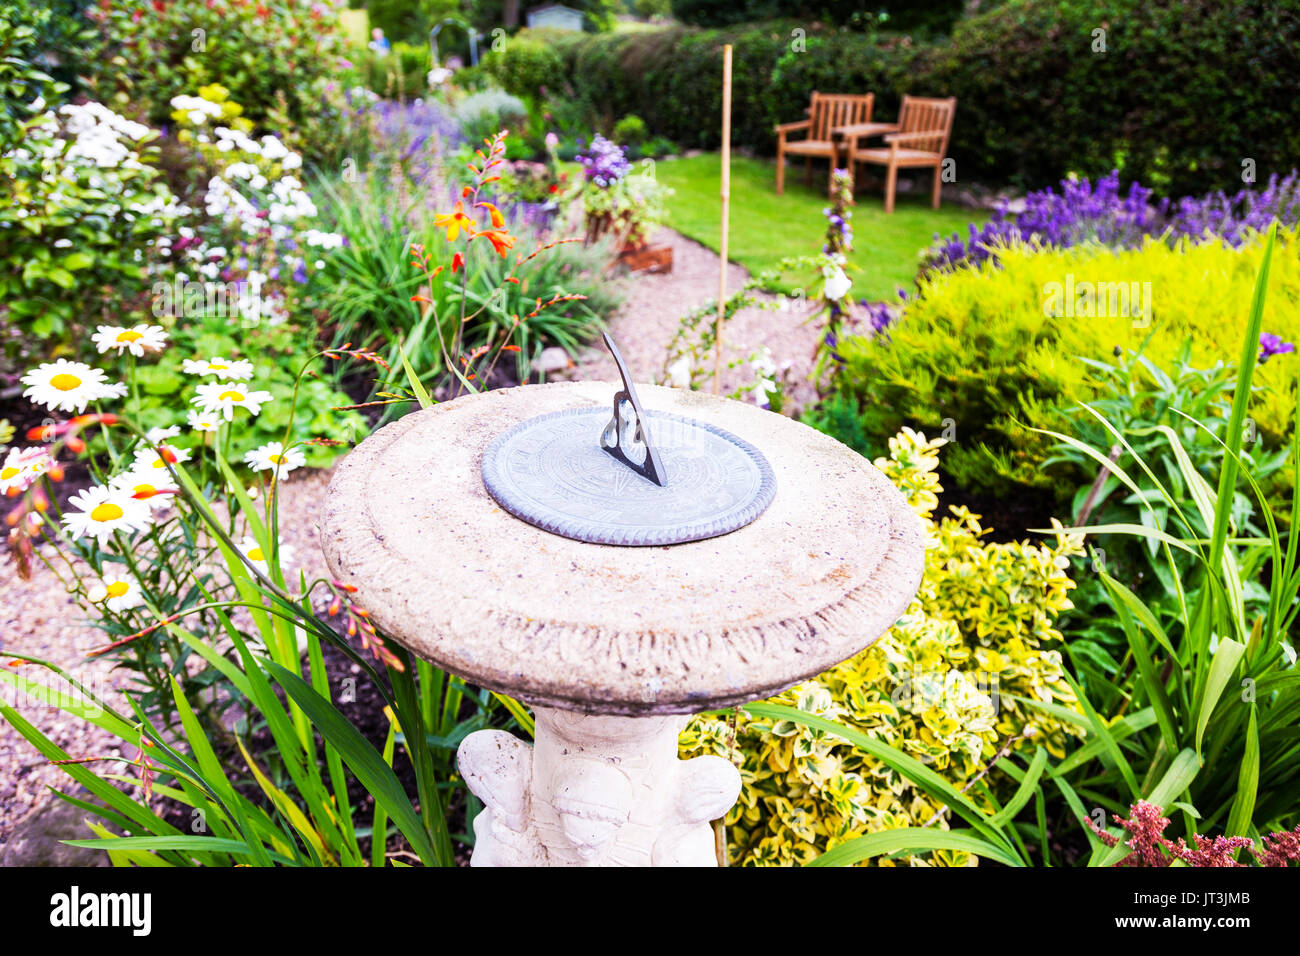 Great Sundial, Sun Dial, Sundial Clock, Sundial Clock In Garden, Sundial Time, Sundial  Garden, Sundial Garden Clock, Sundials, UK, England, UK Sundials